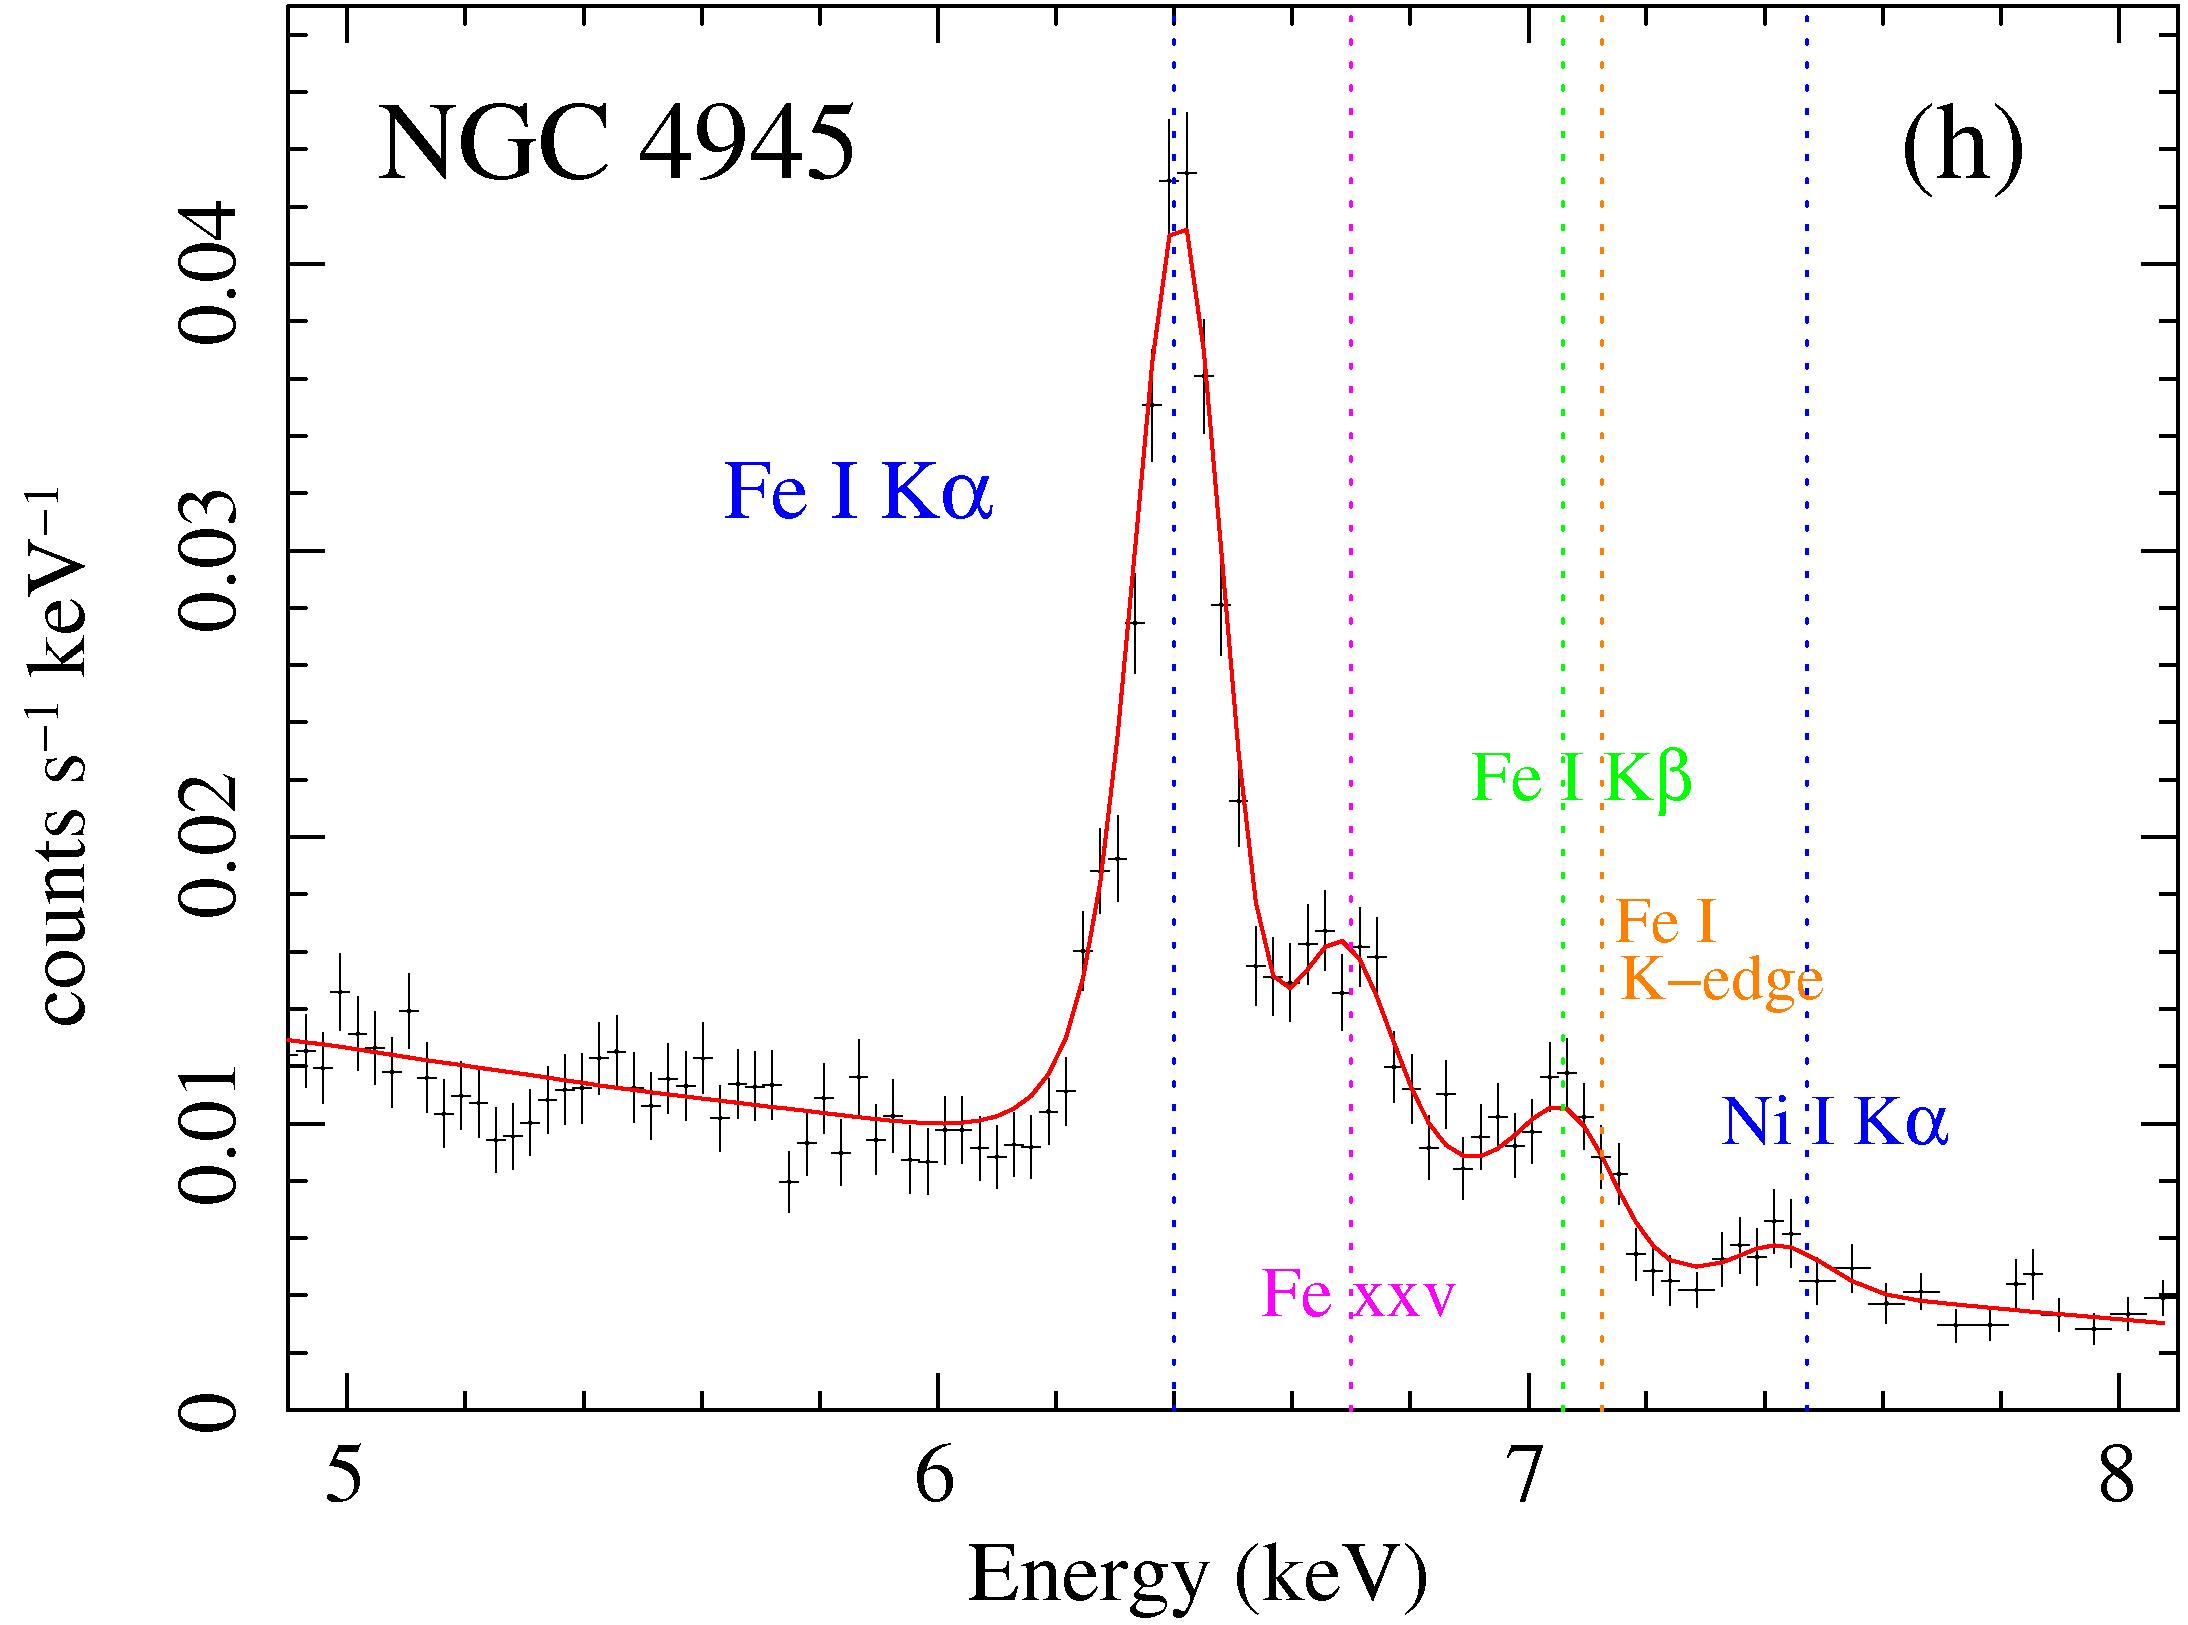 MYTorus fit to NGC 4945 Suzaku data: Fe K alpha line region